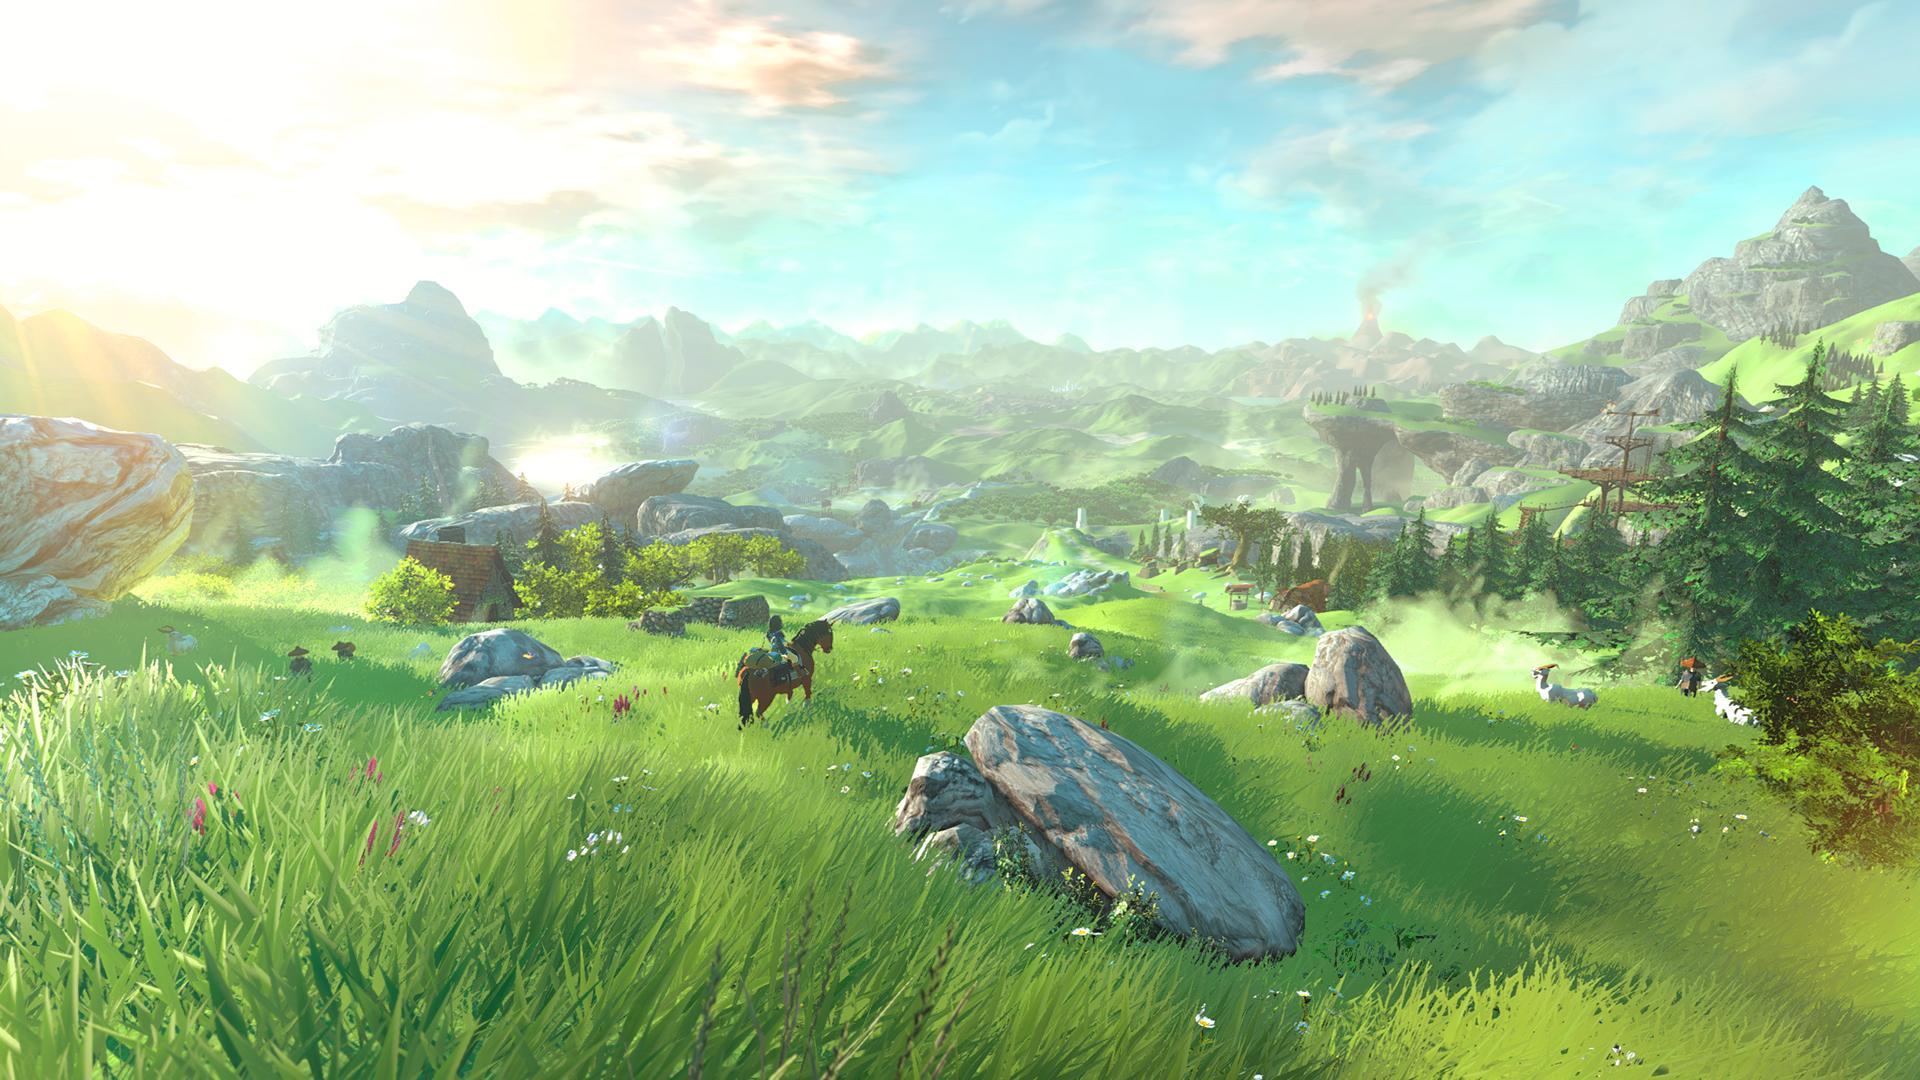 塞尔达传说:荒野之息(The Legend of Zelda: Breath of the Wild)插图